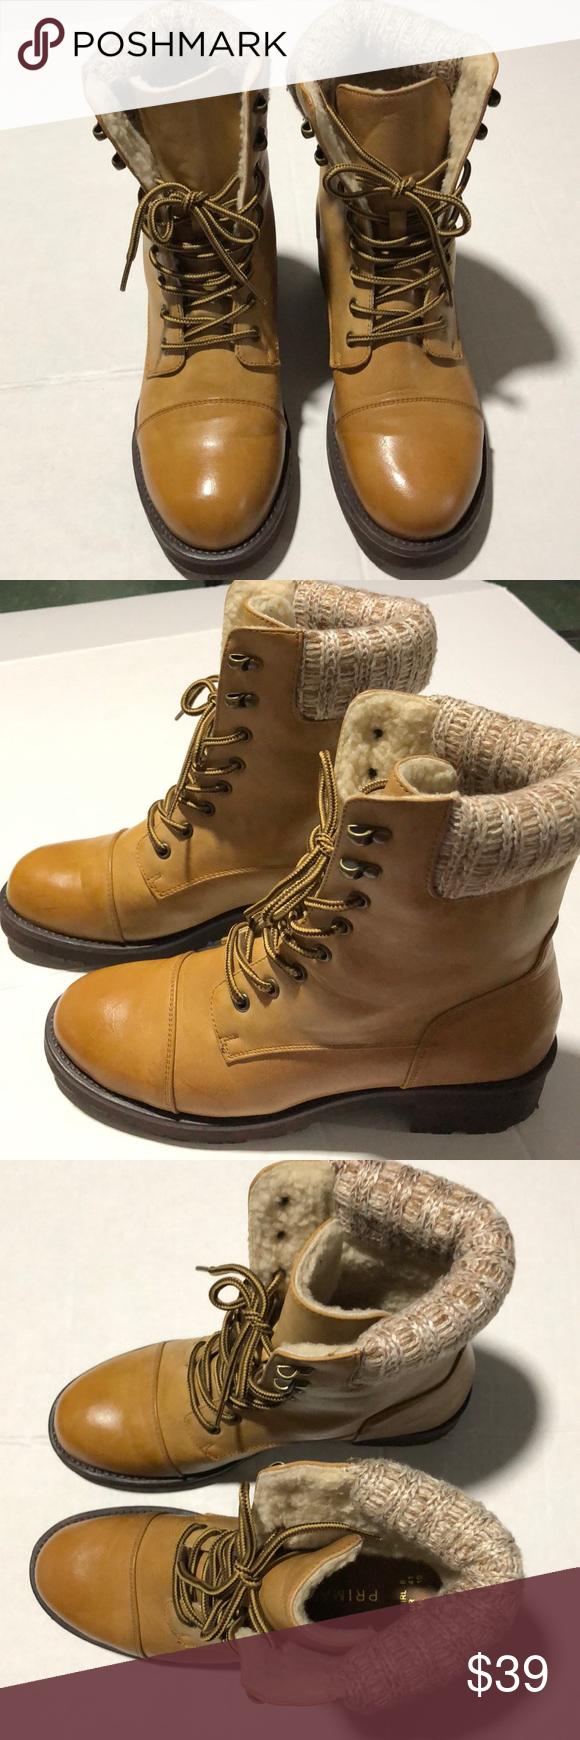 Primark Women S Winter Boots Winter Boots Women Winter Boots Boots